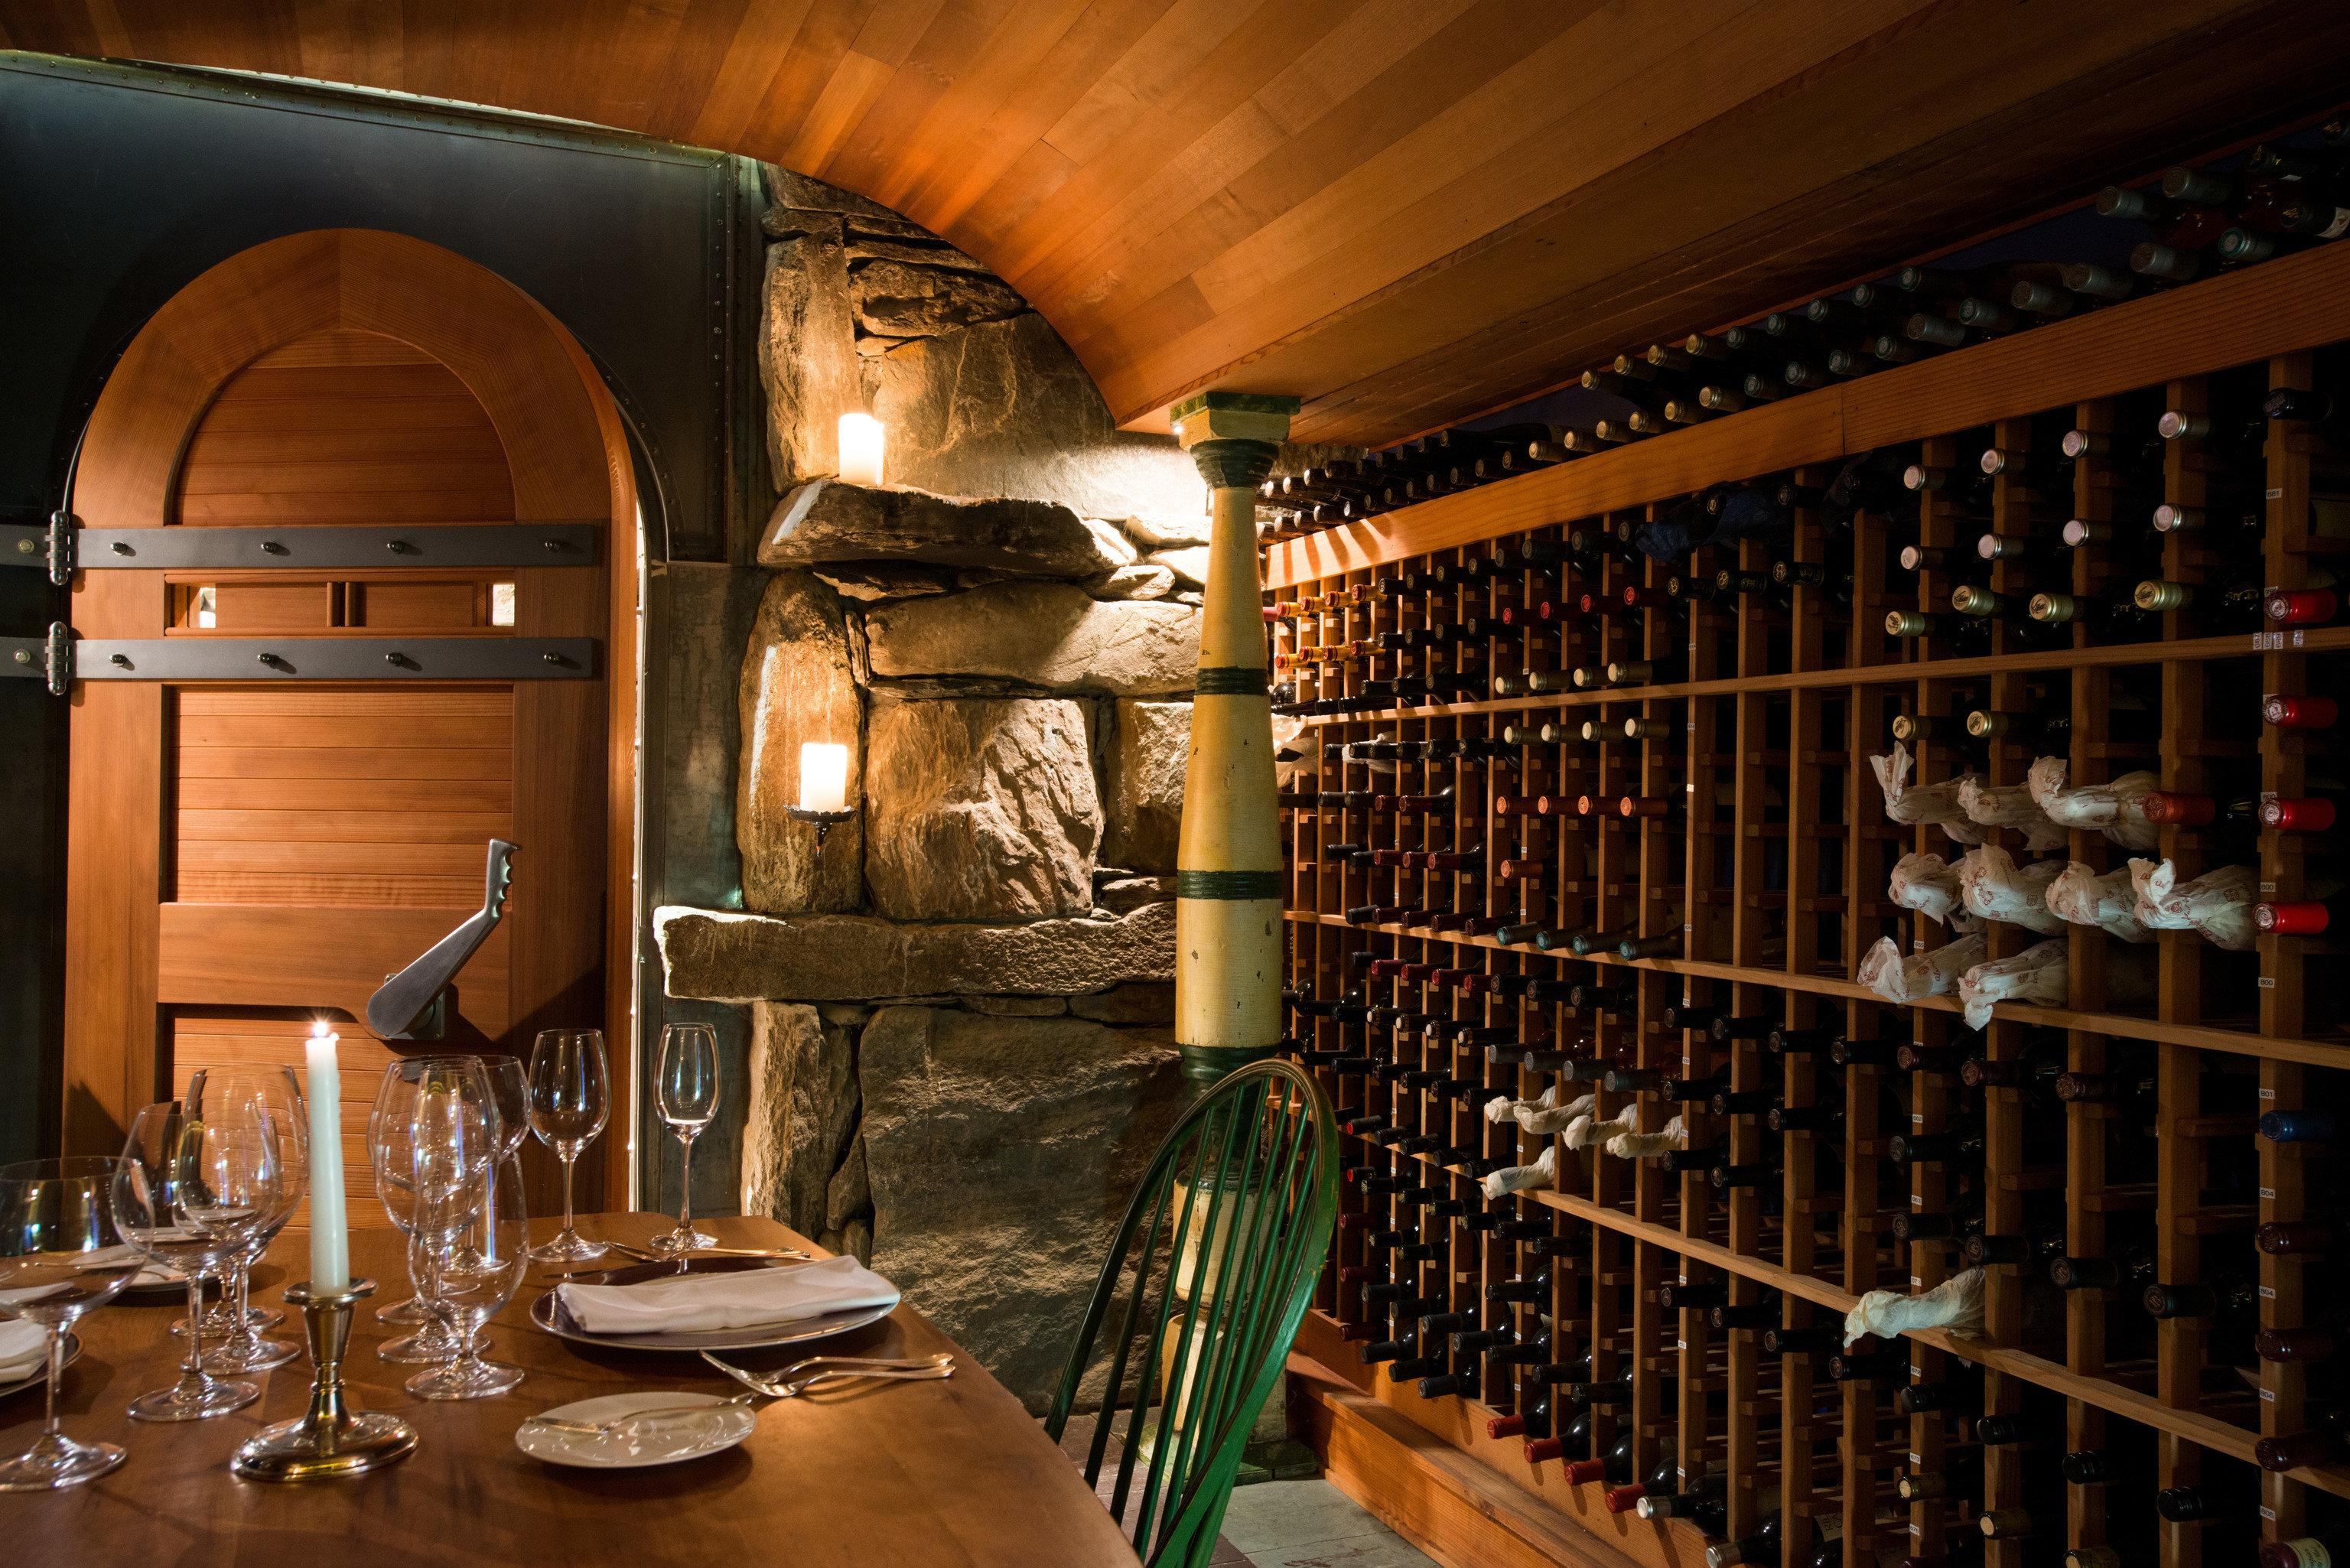 Hotels Romance man made object Winery wine cellar Bar restaurant basement